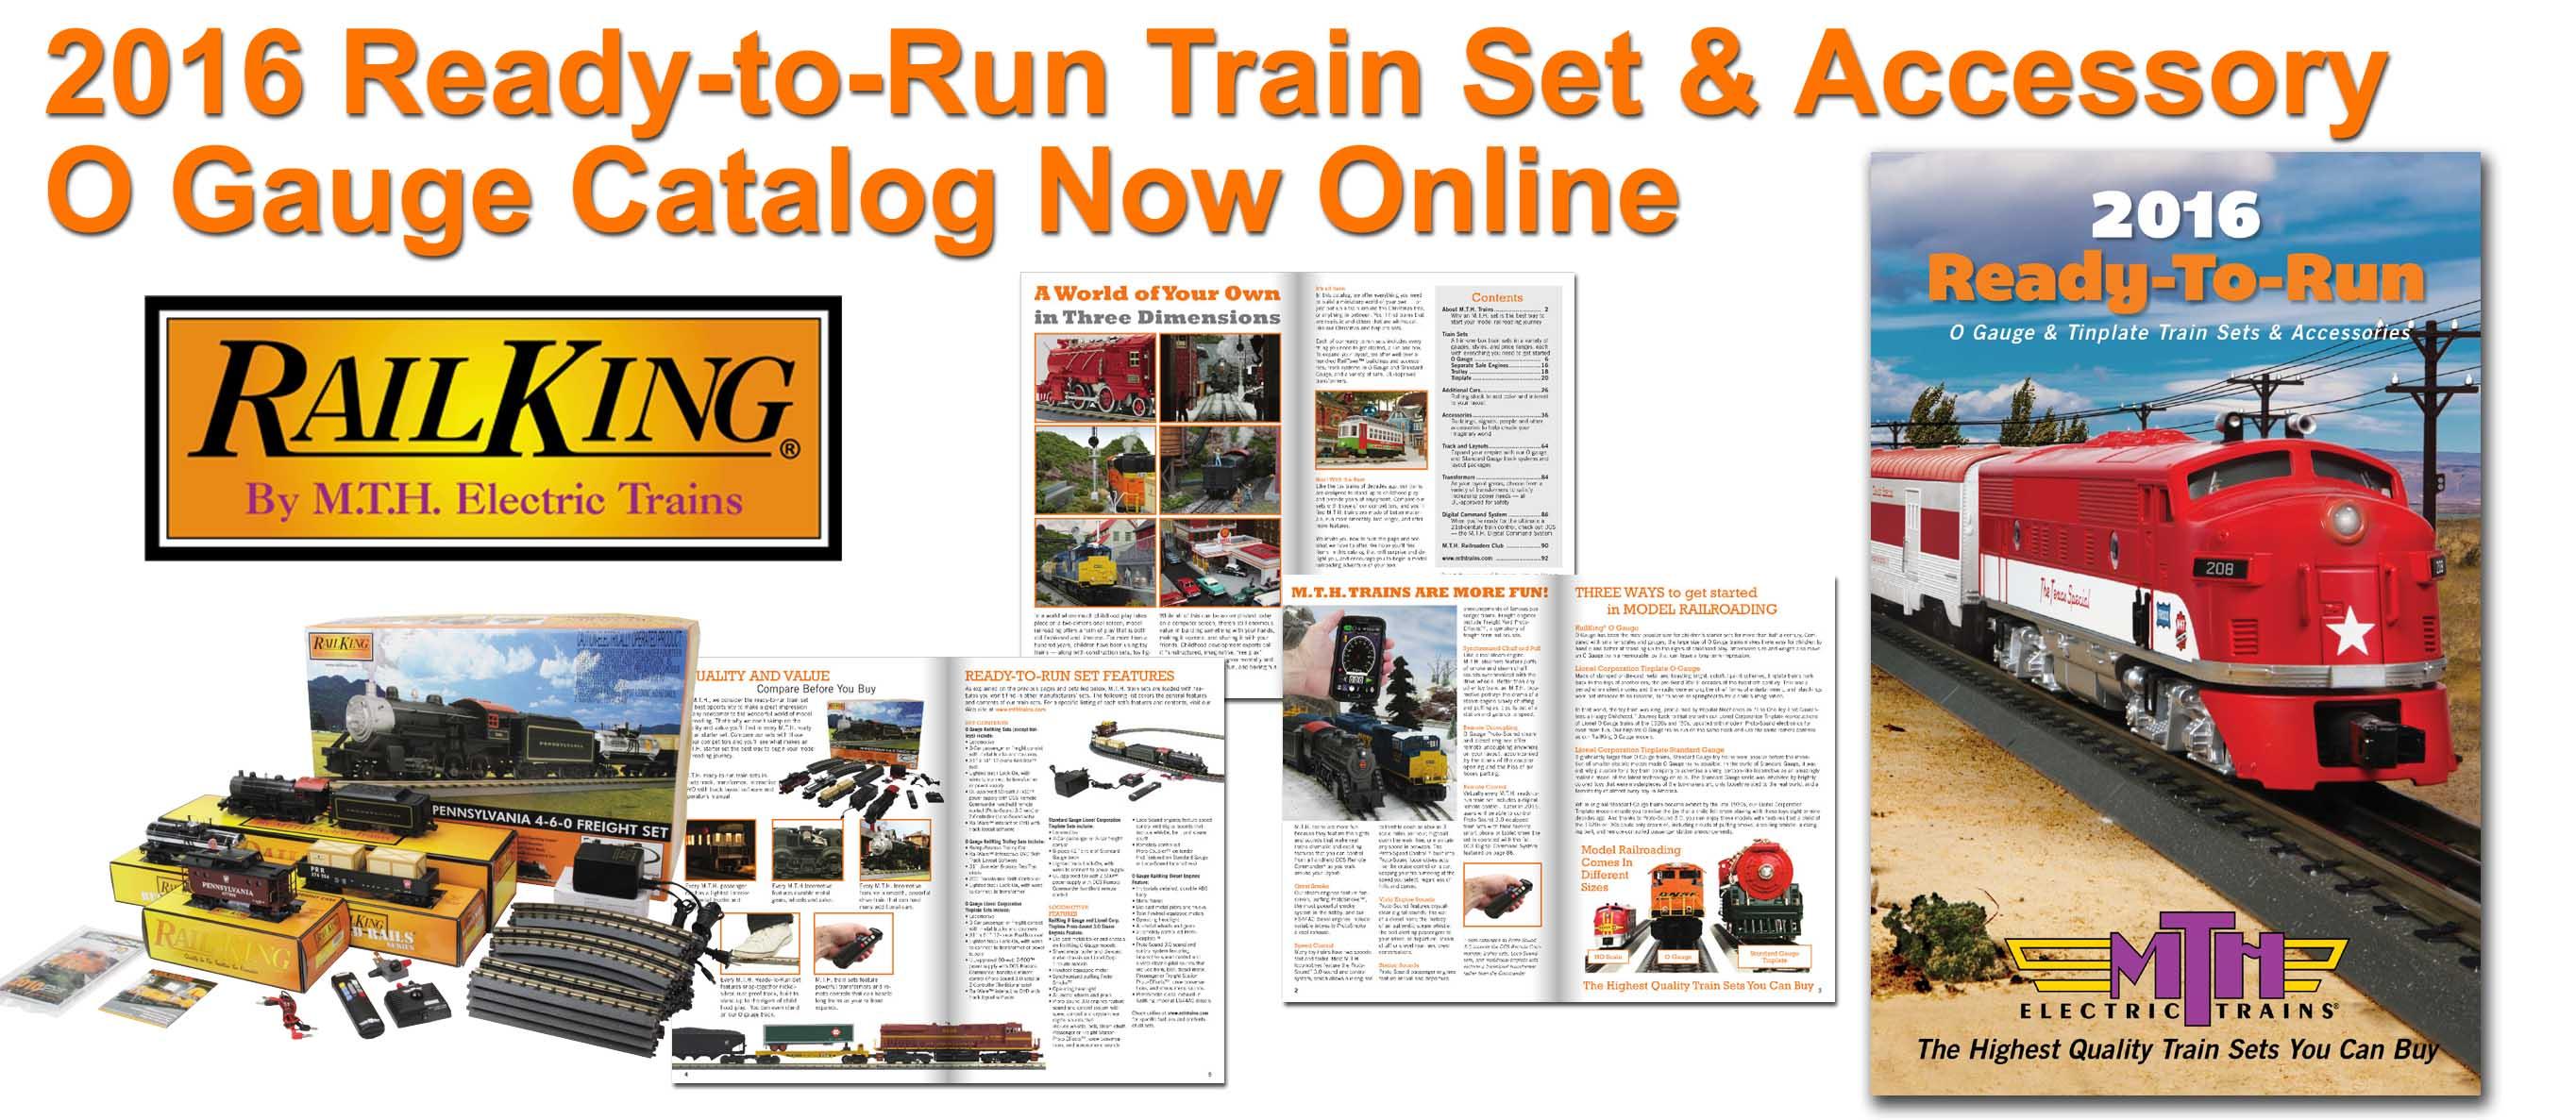 7e14ebd00f5b 2016 Ready-to-Run Train Set and Accessory Catalog Now Online